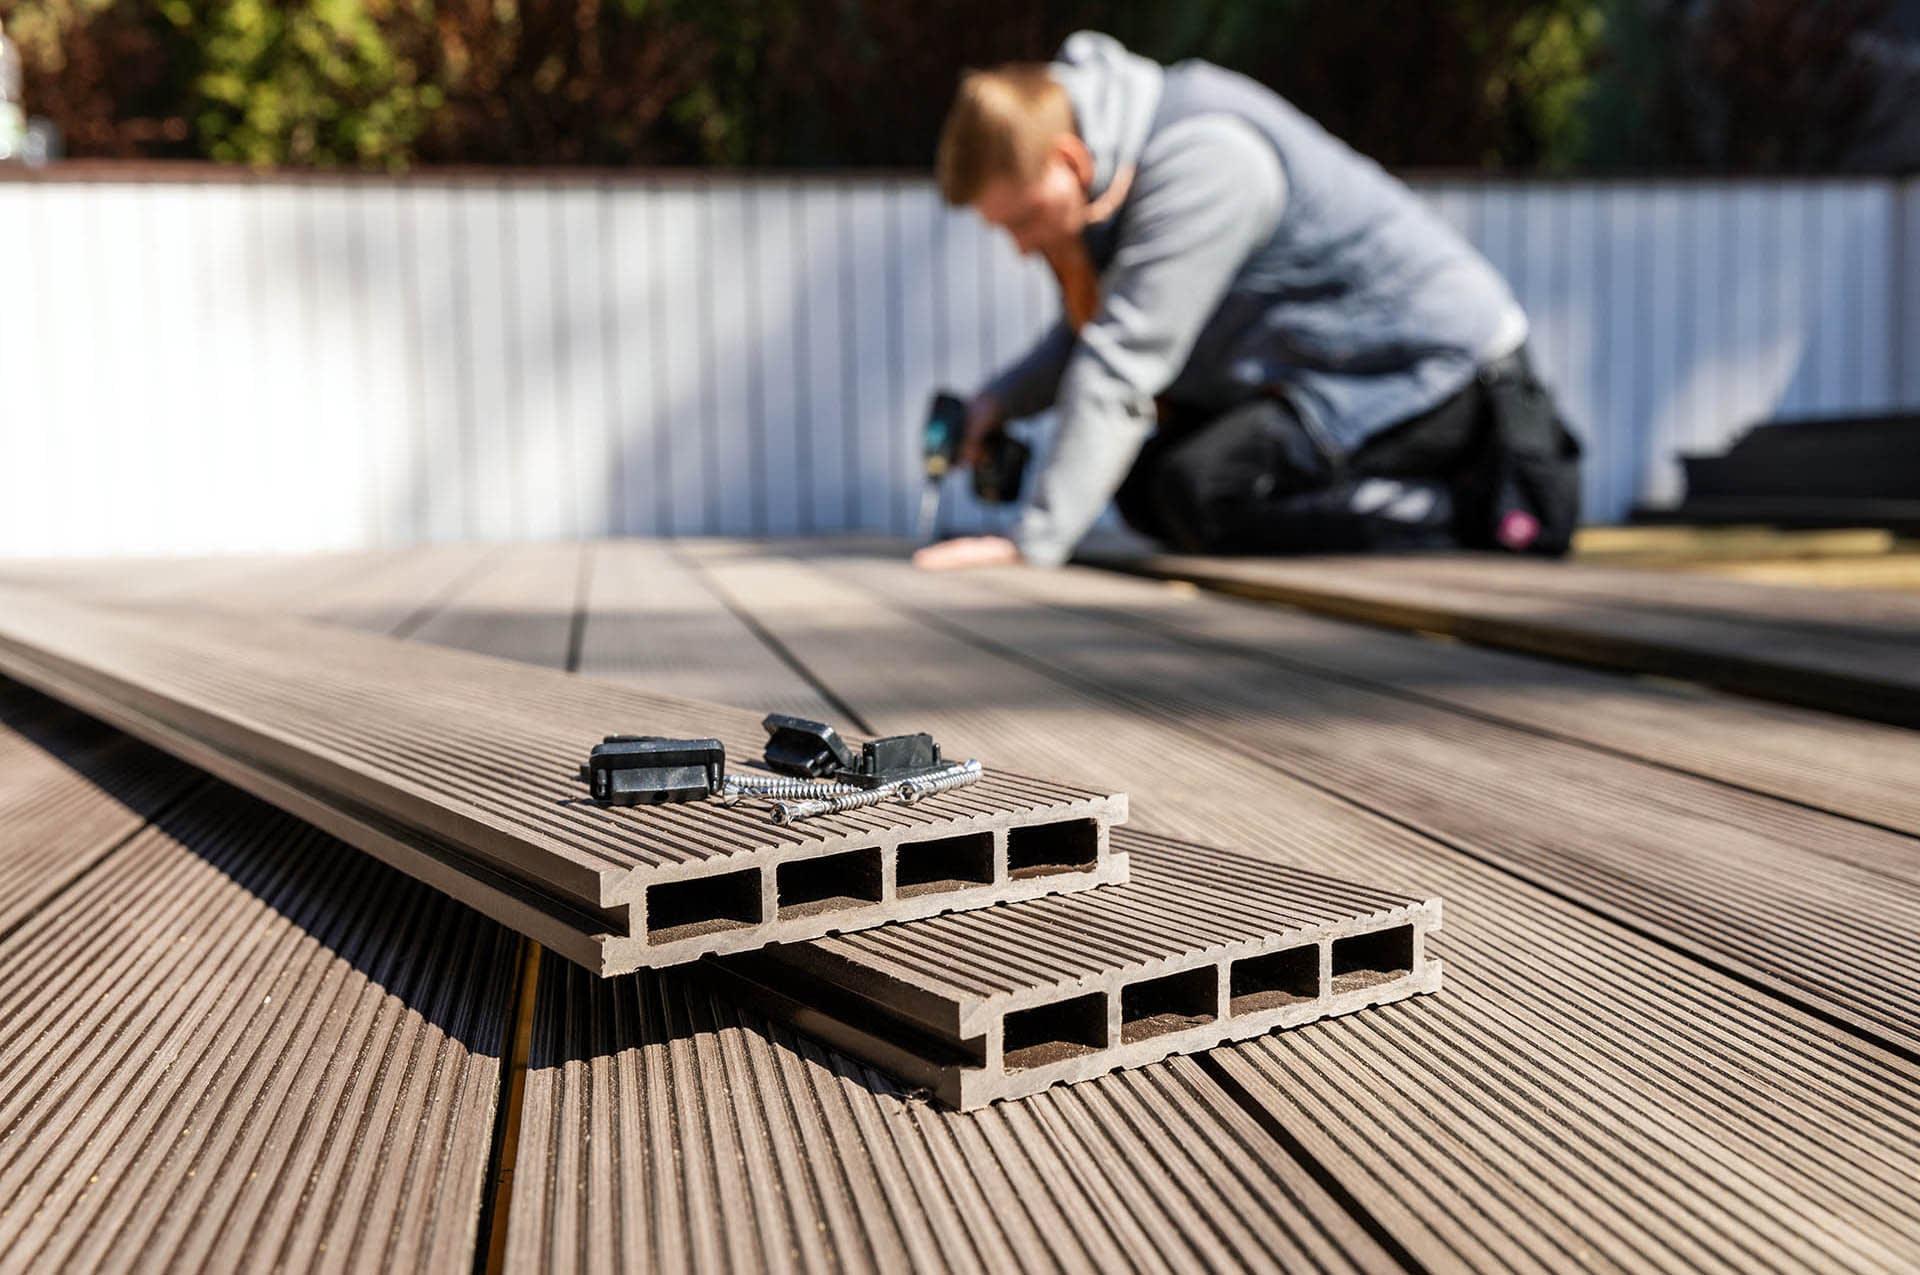 Worker installing wood plastic Cladco composite decking boards - composites alternatives